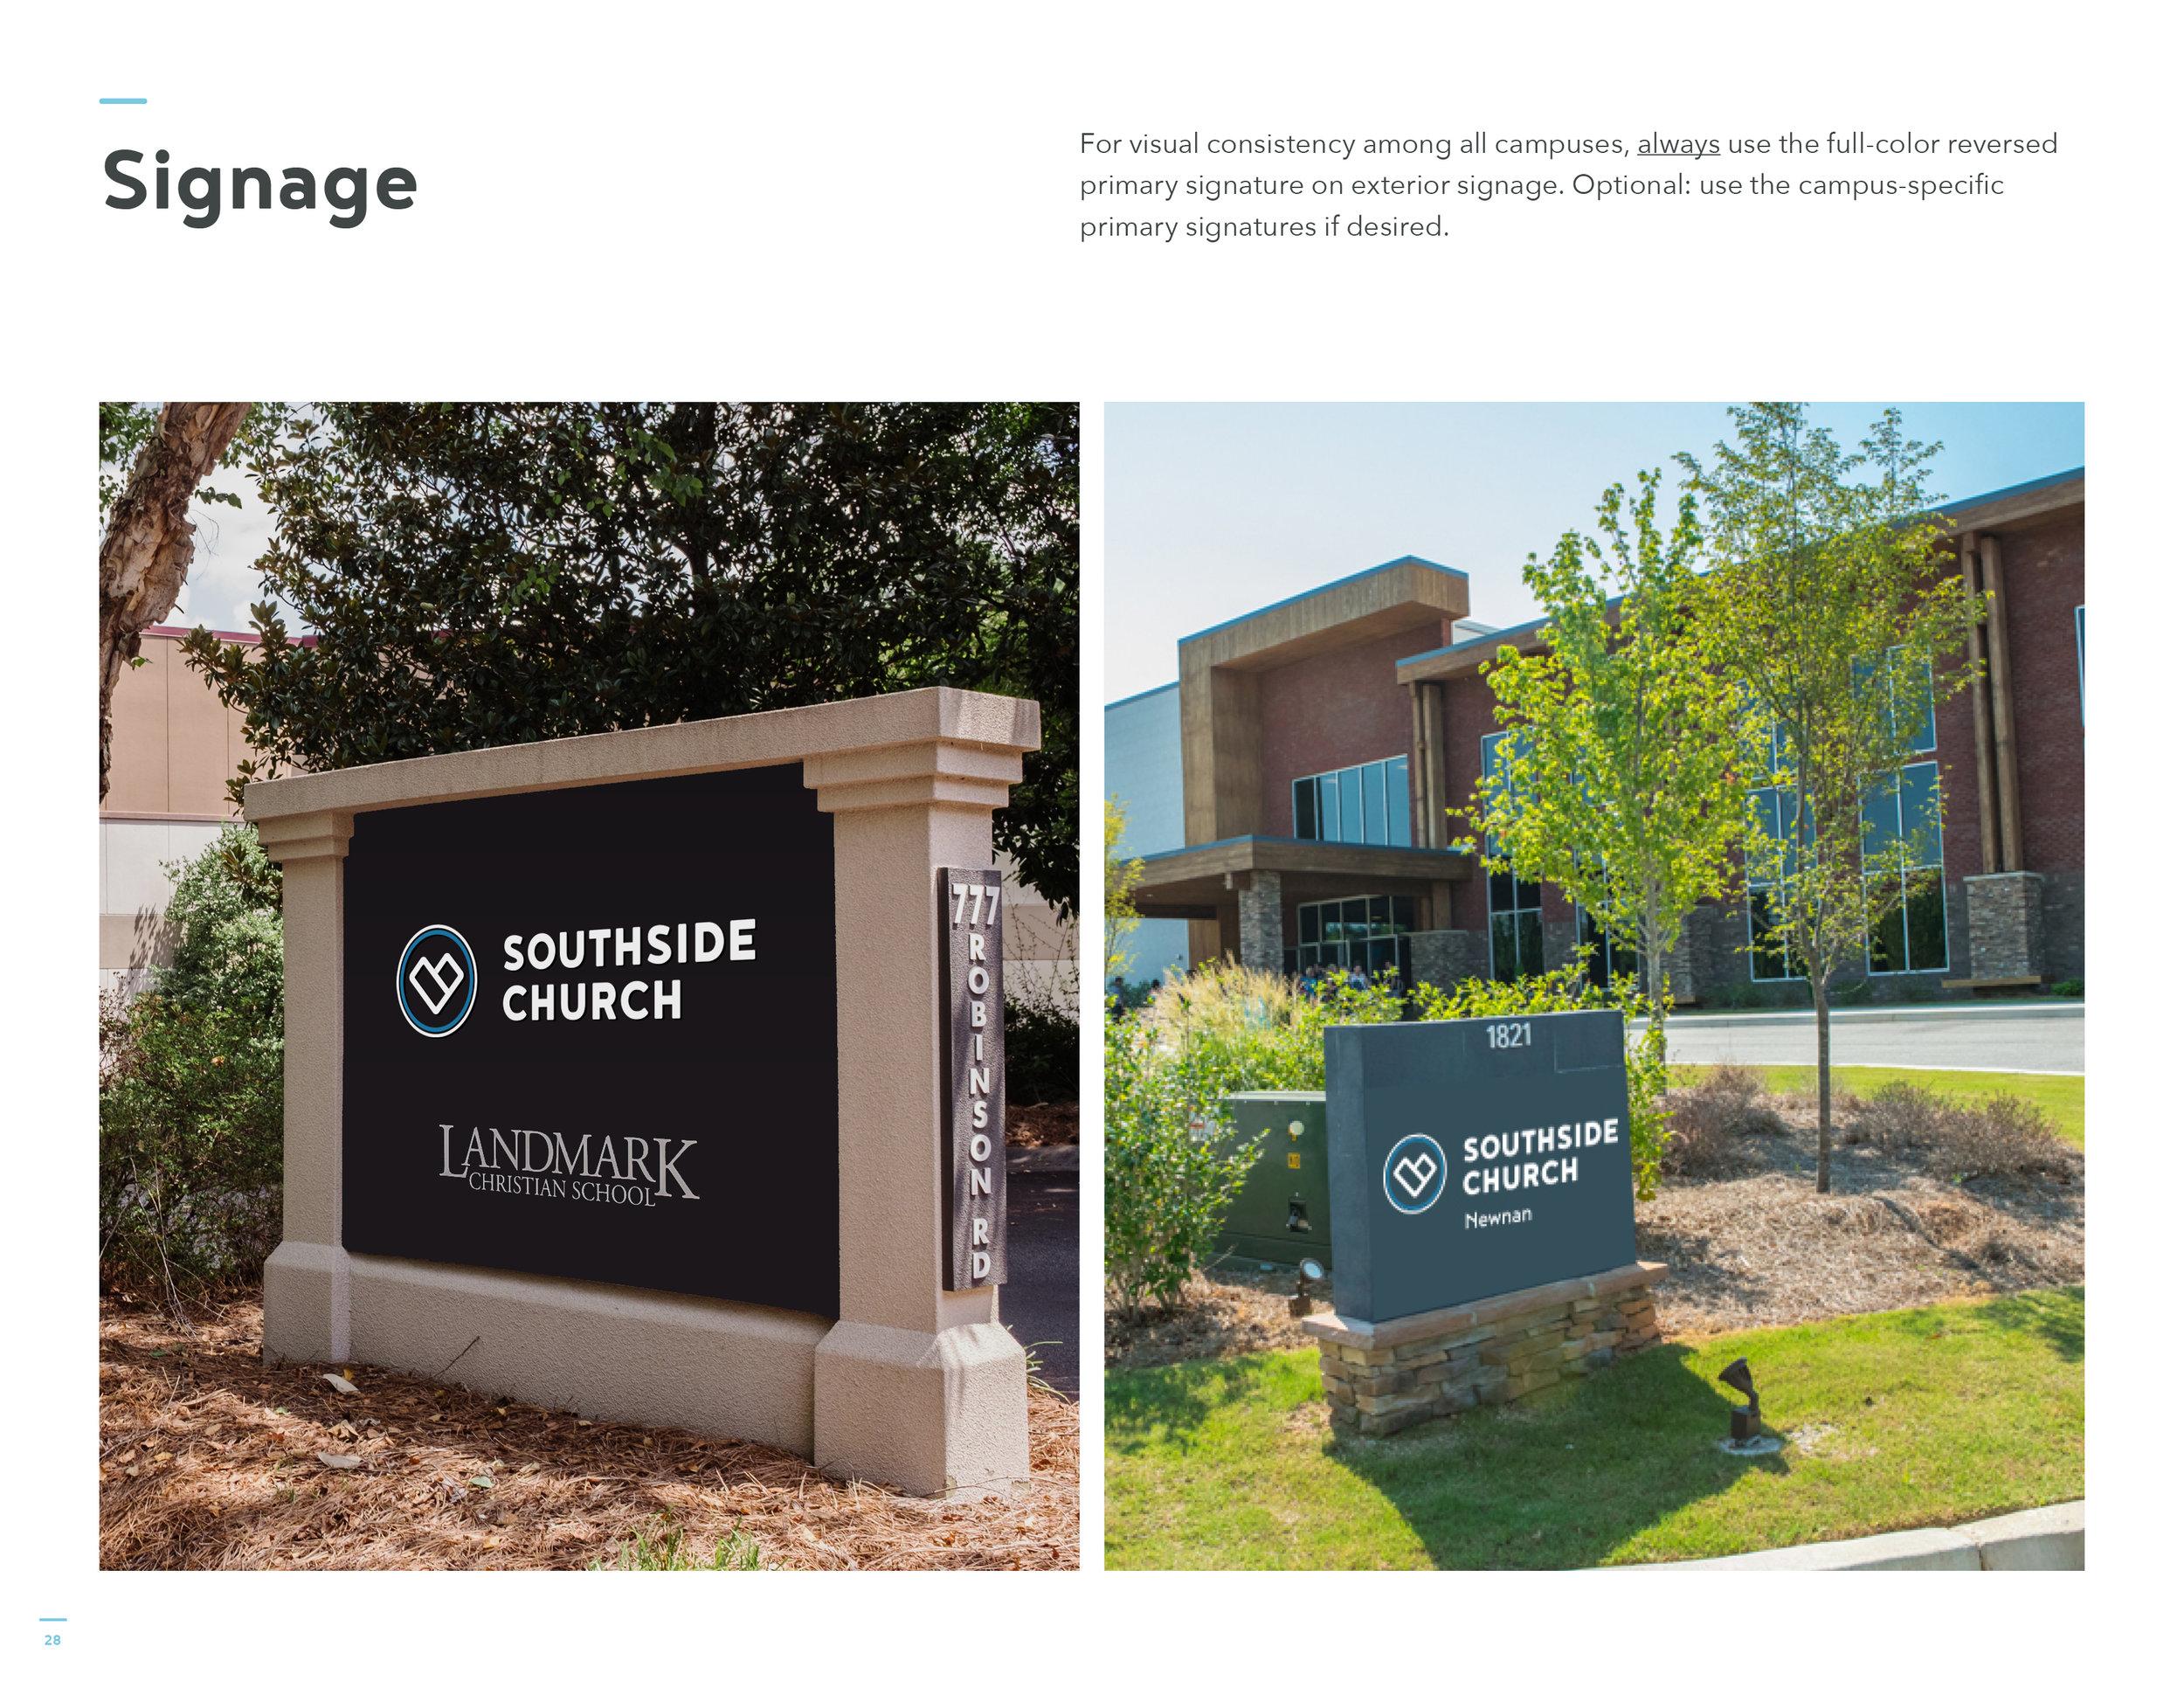 south_signage.jpg